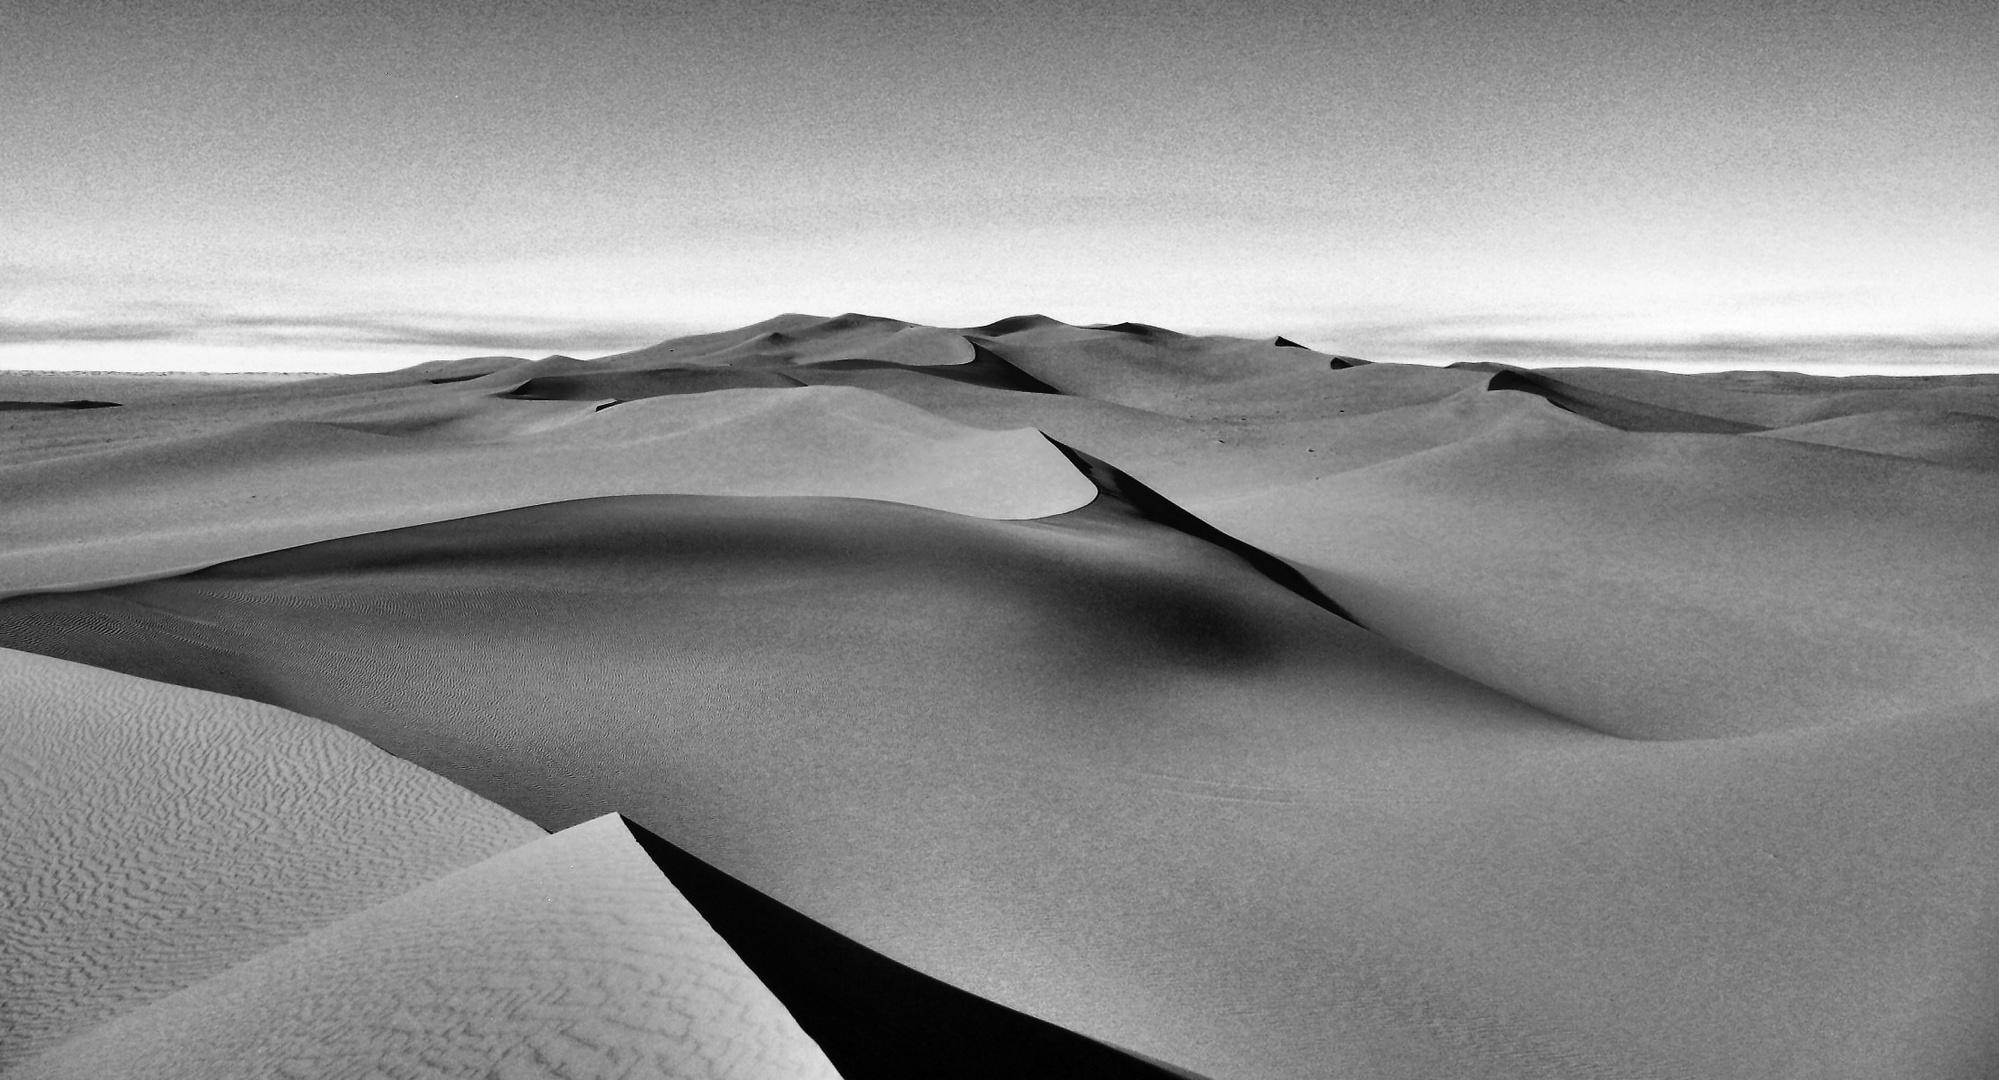 Sahara s/w